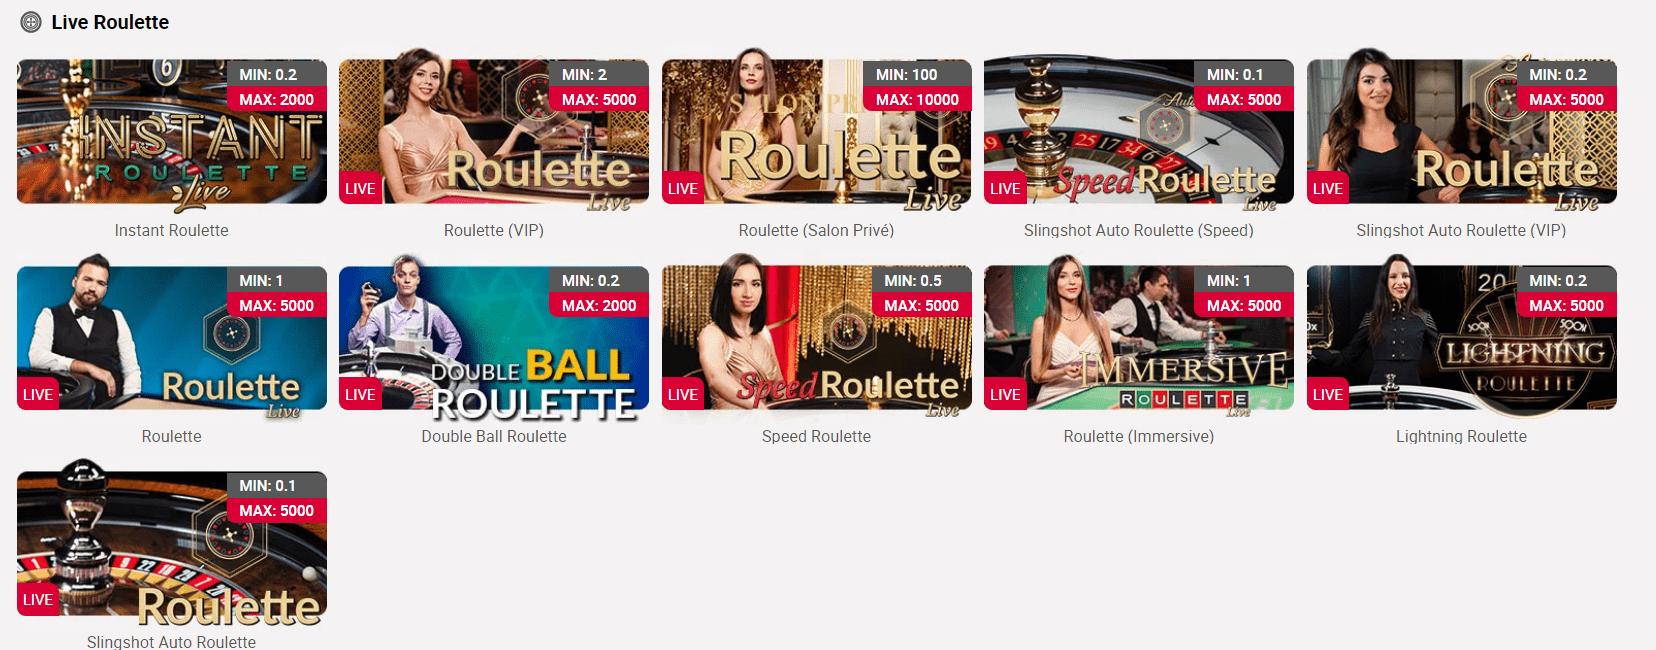 live roulette ch